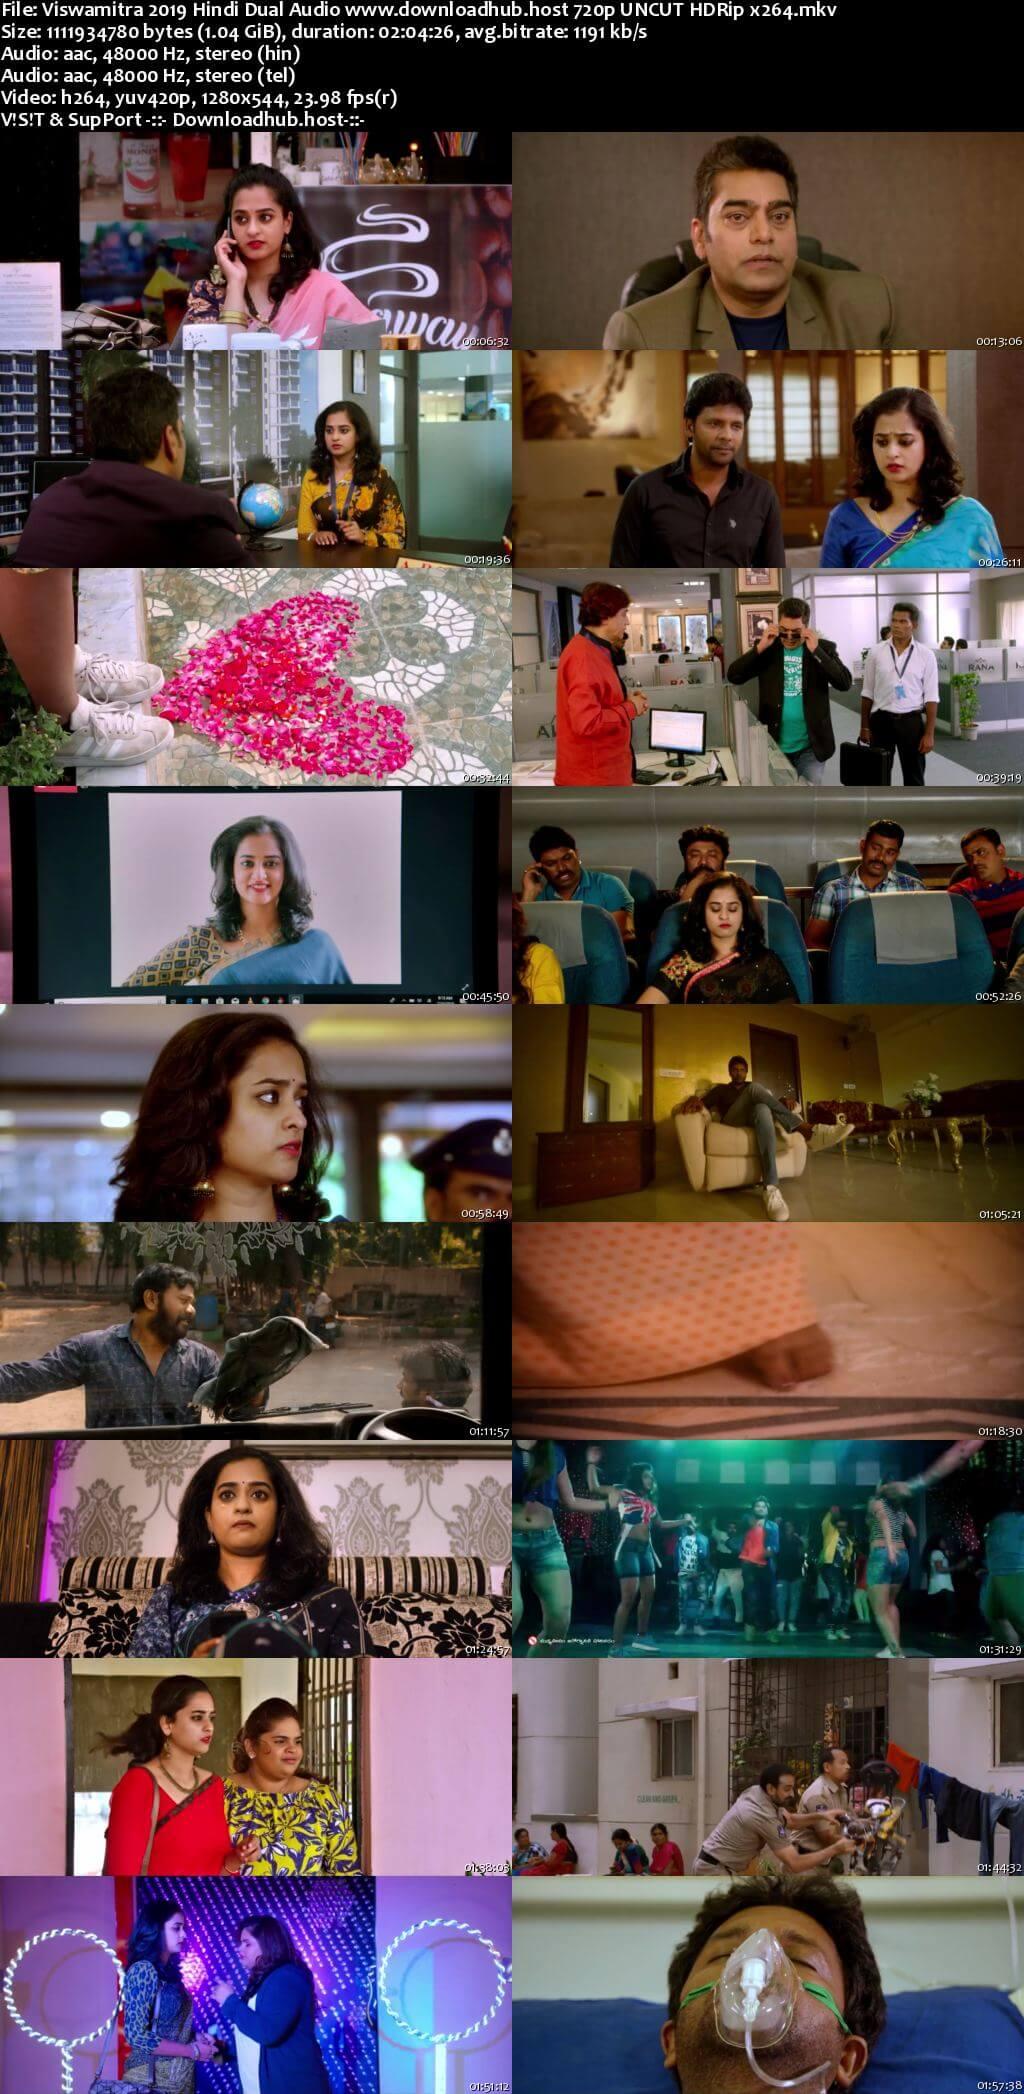 Viswamitra 2019 Hindi Dual Audio 720p UNCUT HDRip x264